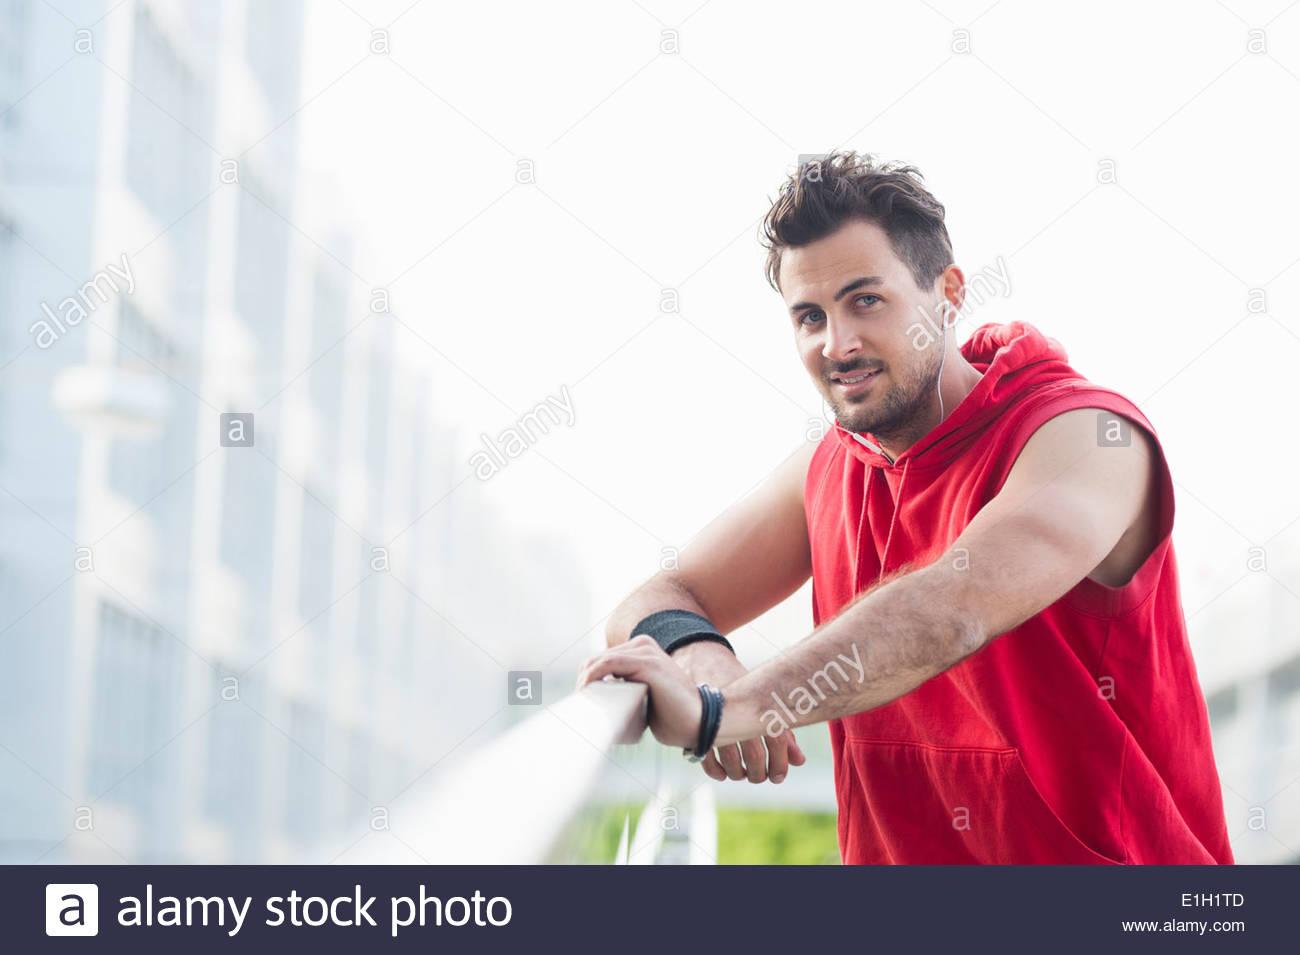 Jogger taking break - Stock Image